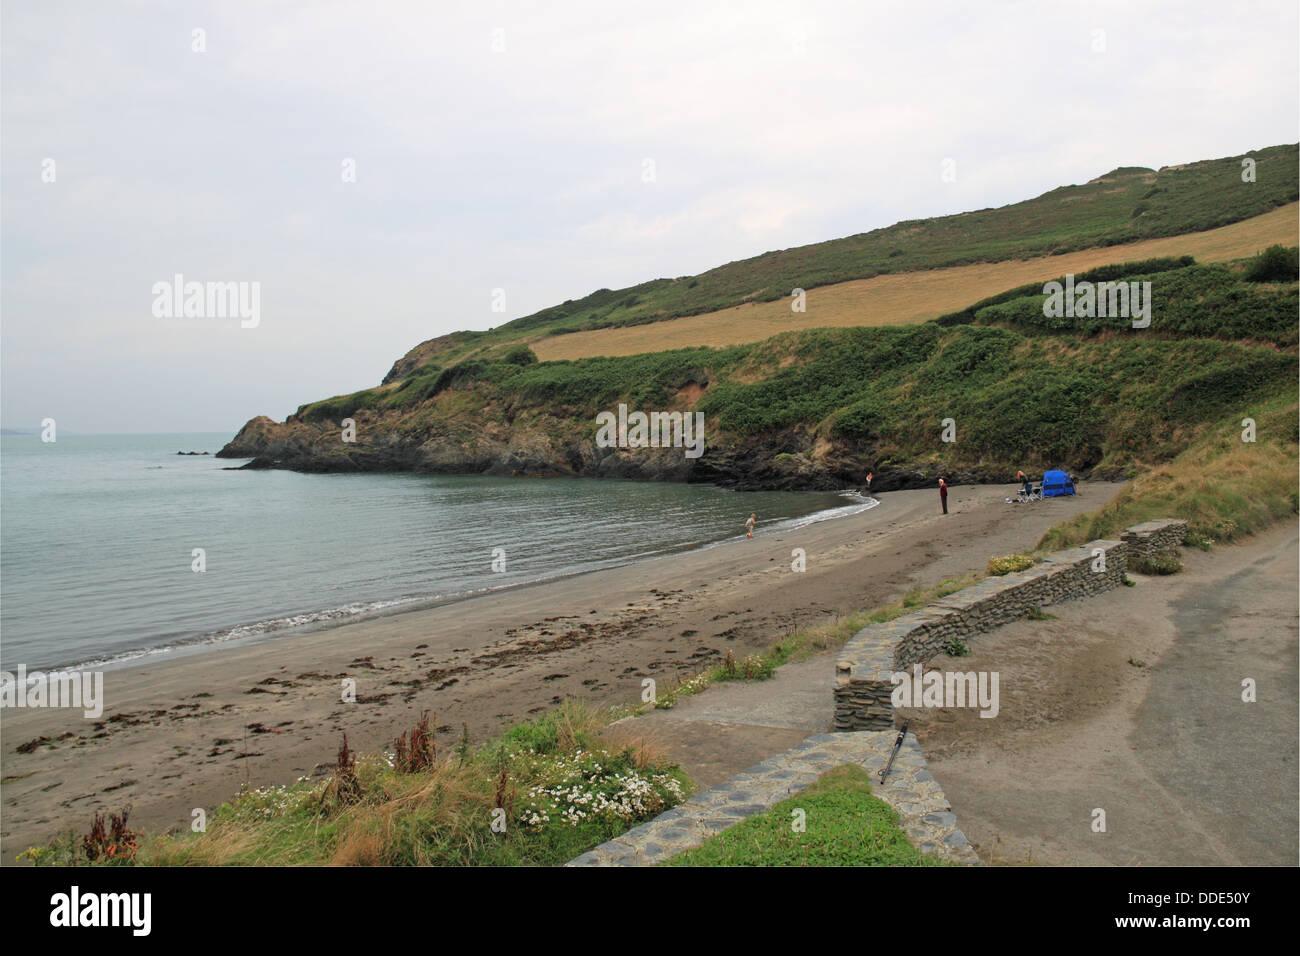 Pwllgwaelod beach, Pembrokeshire, Wales, Great Britain, United Kingdom, UK, Europe - Stock Image